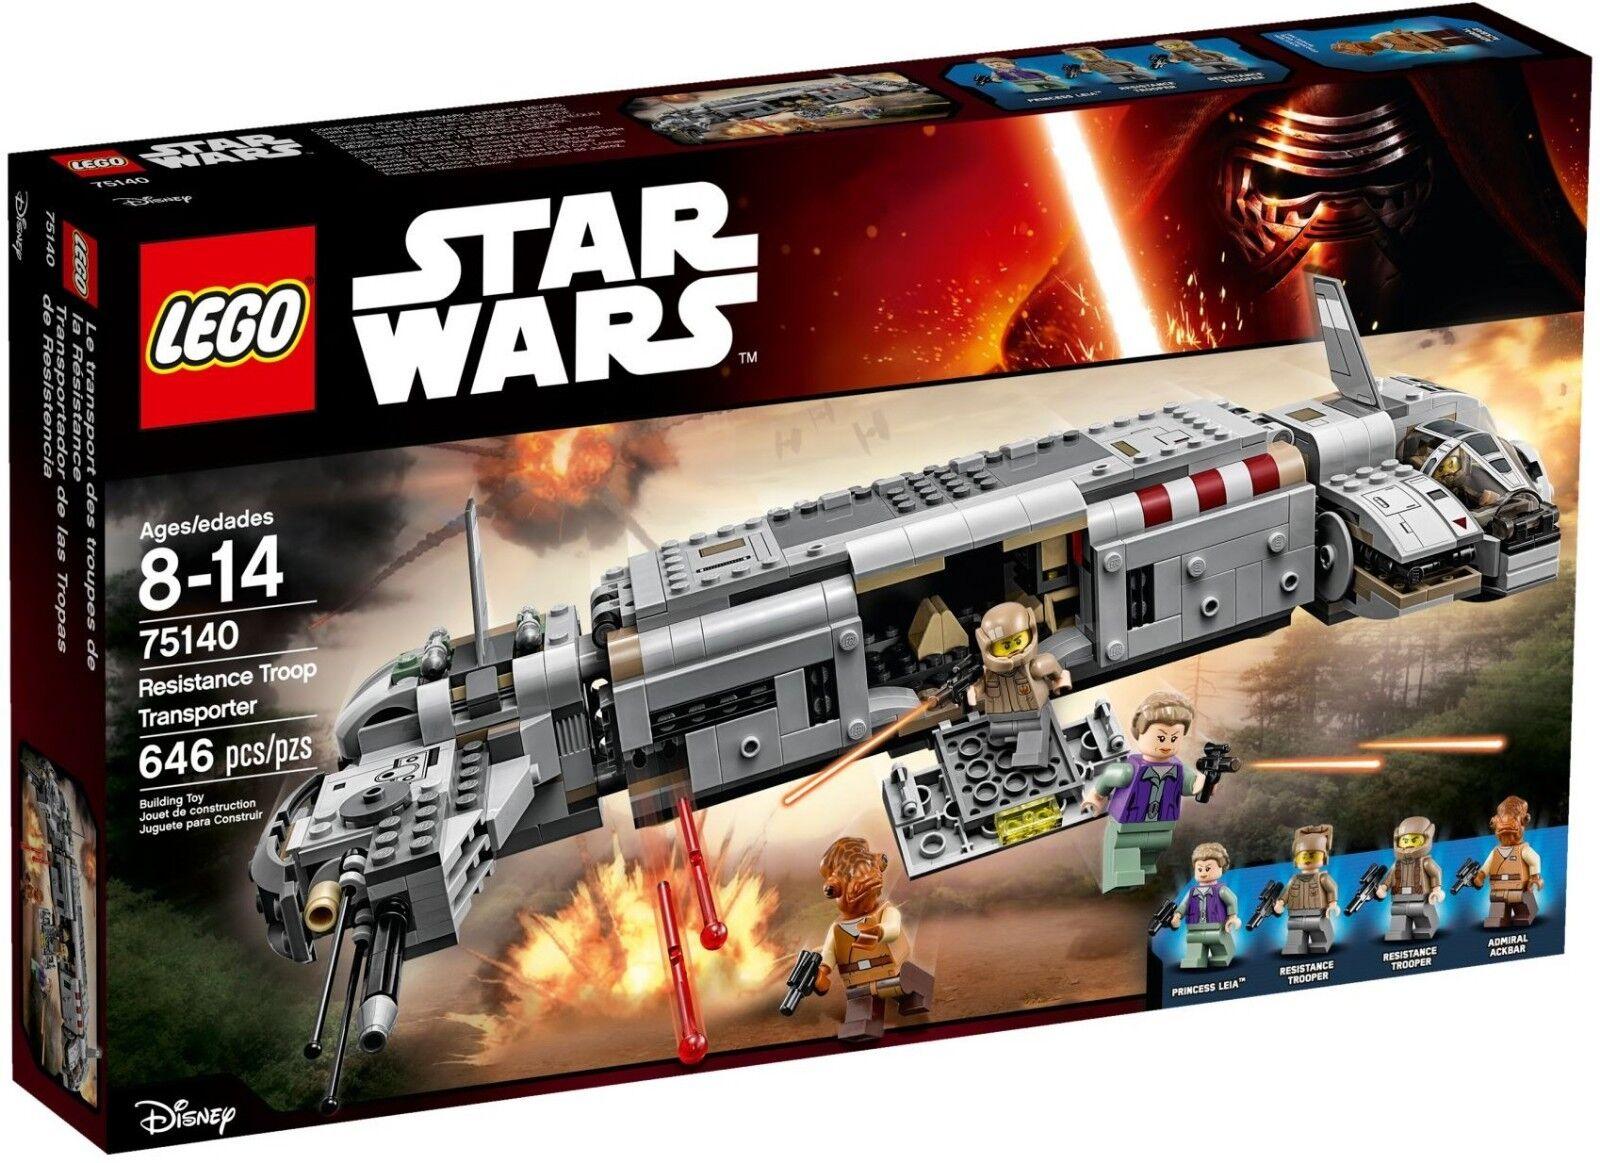 LEGO Star Wars 75140 Resistance Troop Transporter  - Brand New and Sealed